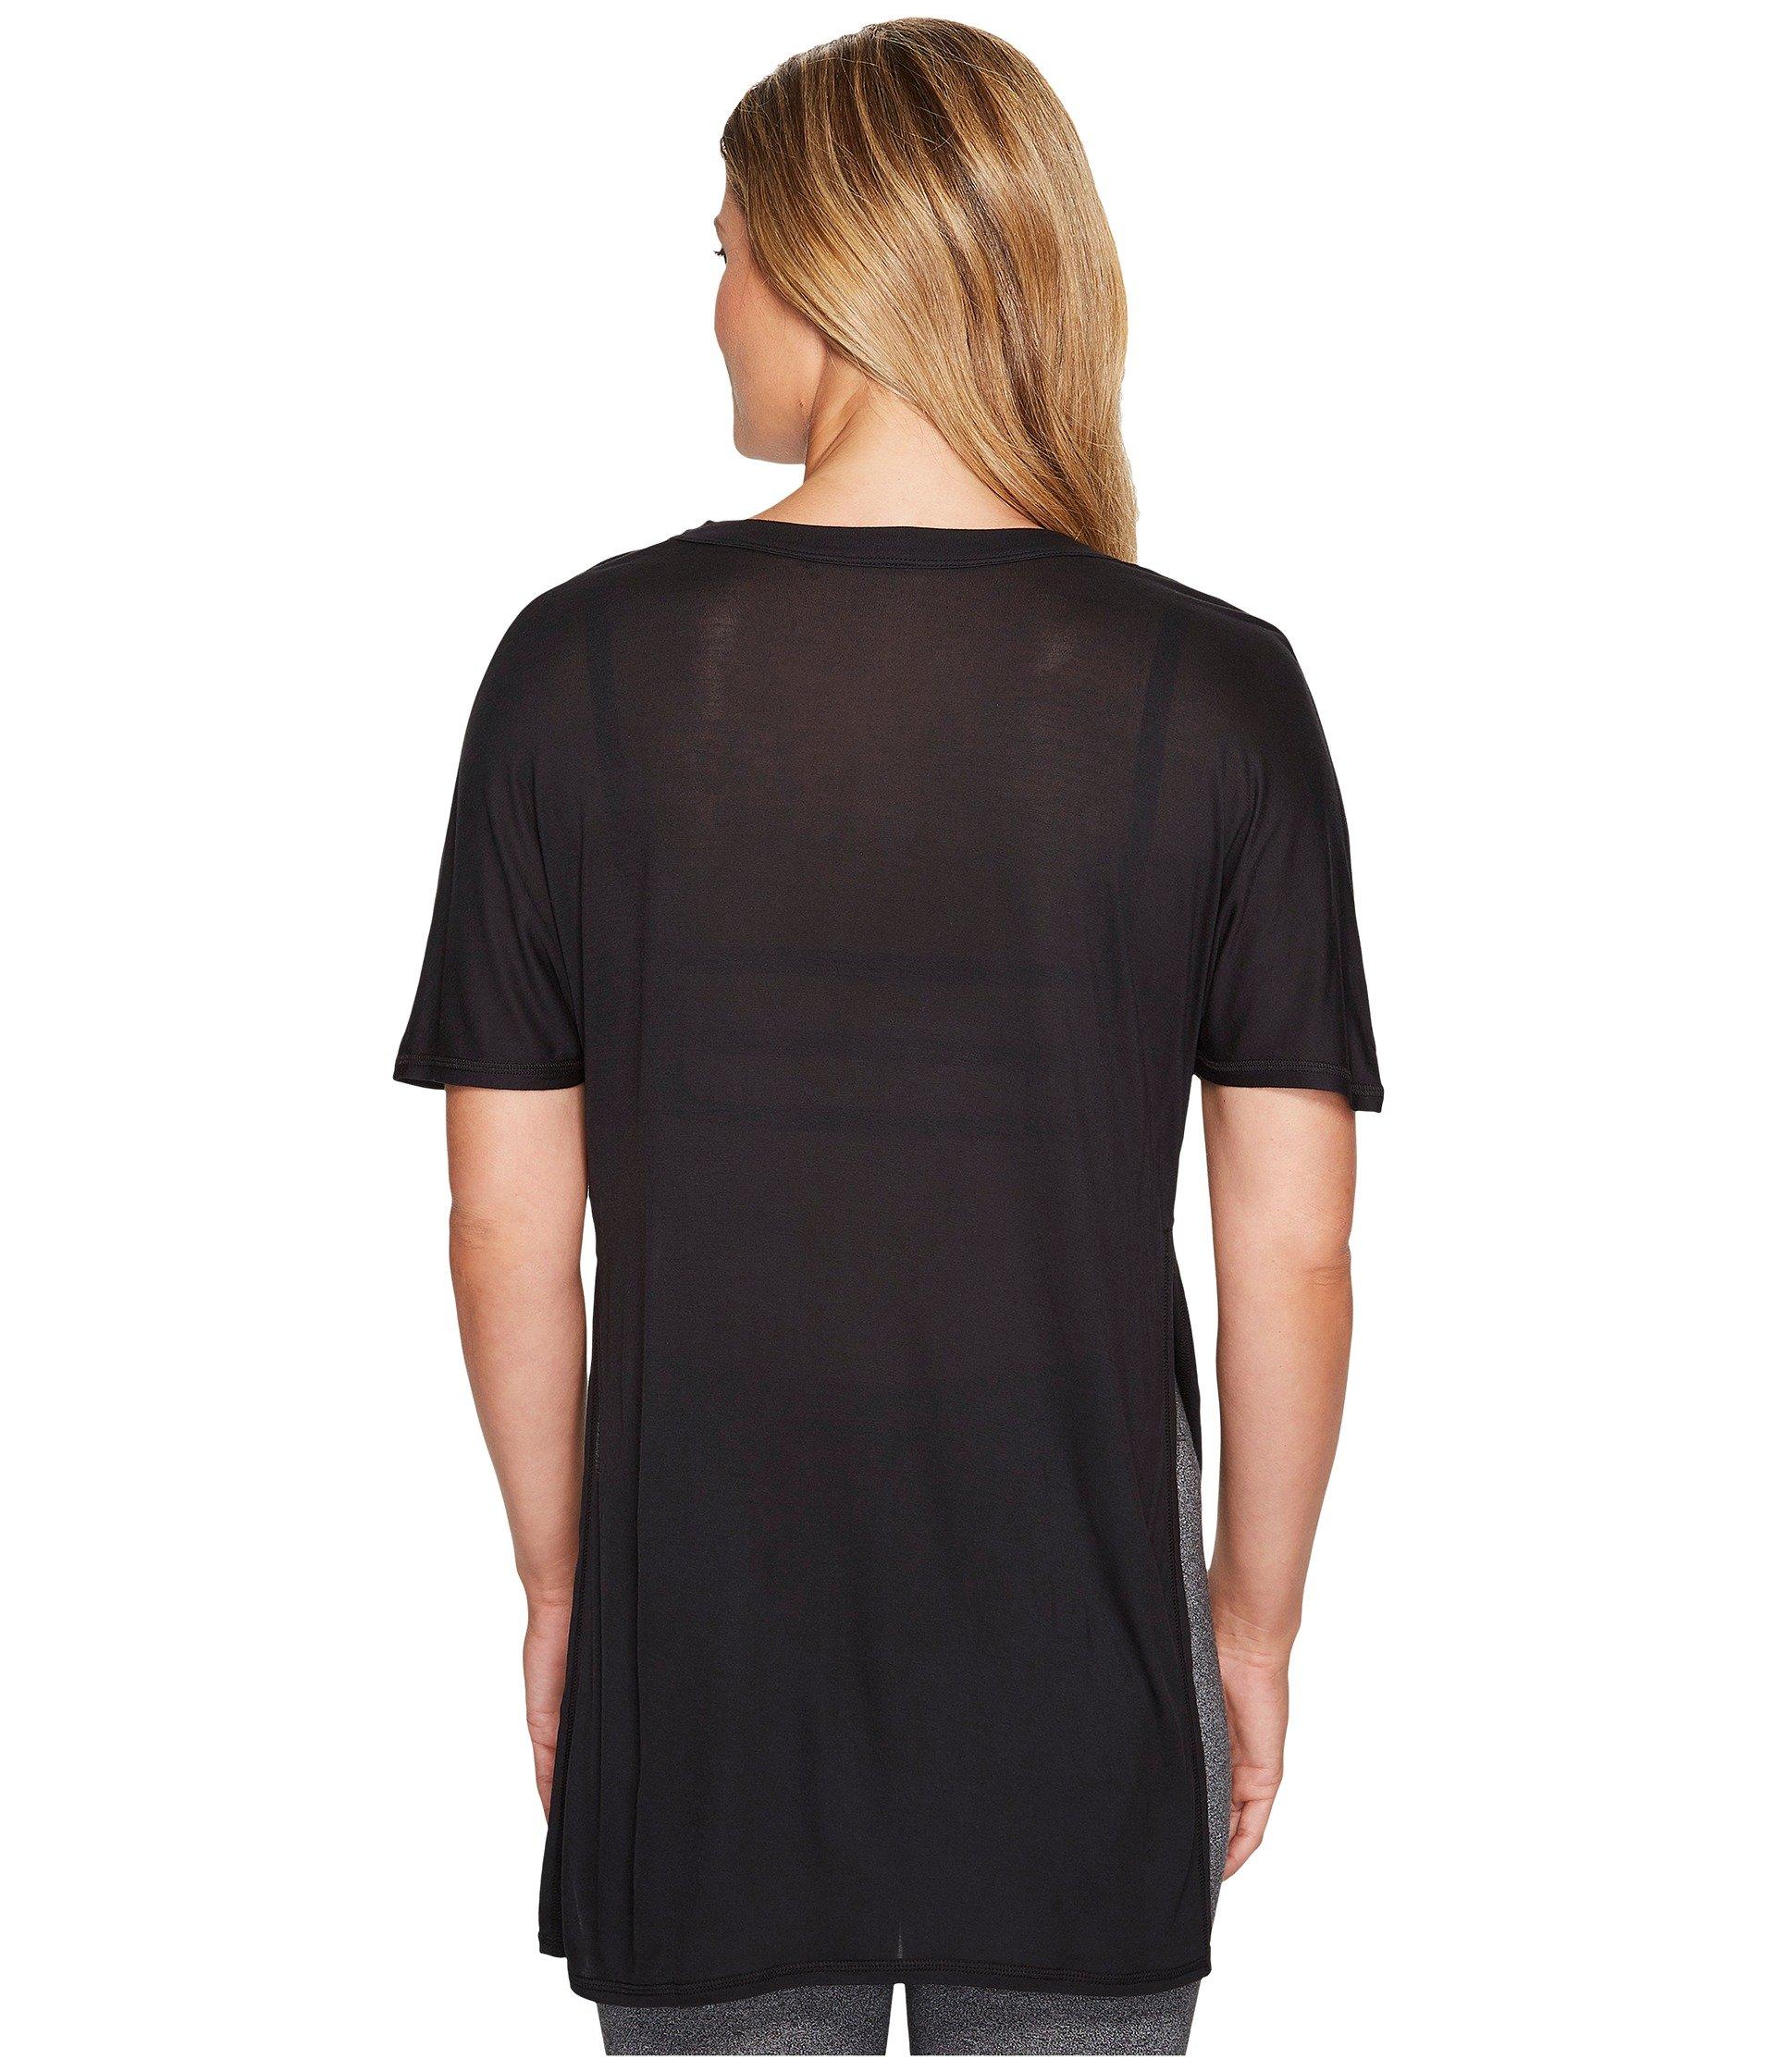 Sleeve Black Top Alo Short Dreamer a1wRqpE7